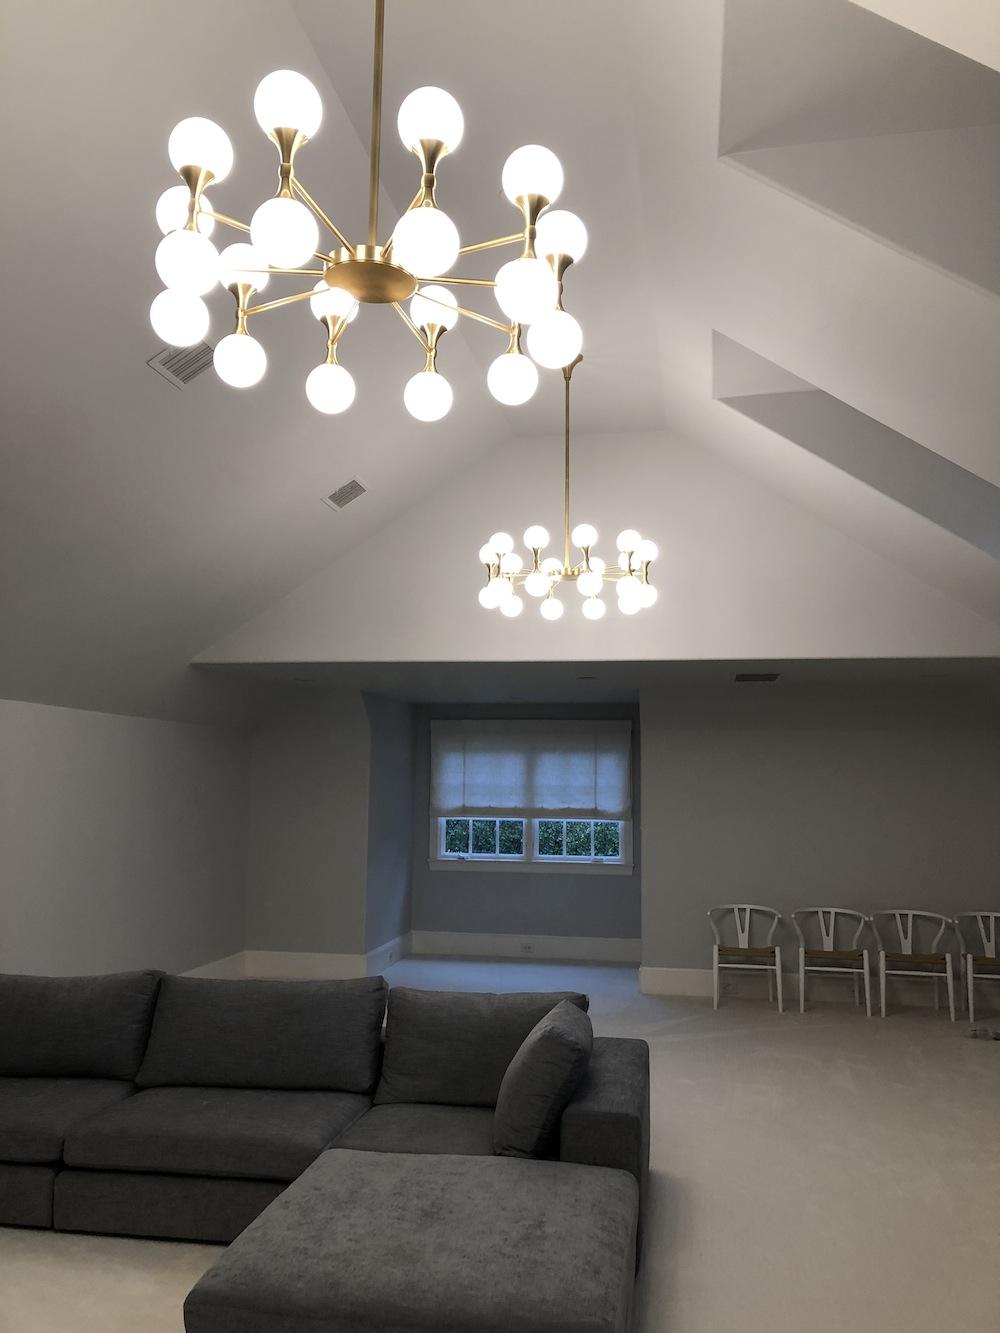 IHudson-Valley-Lighting-Article-Sofa-Hayneedle-Chairs.jpg